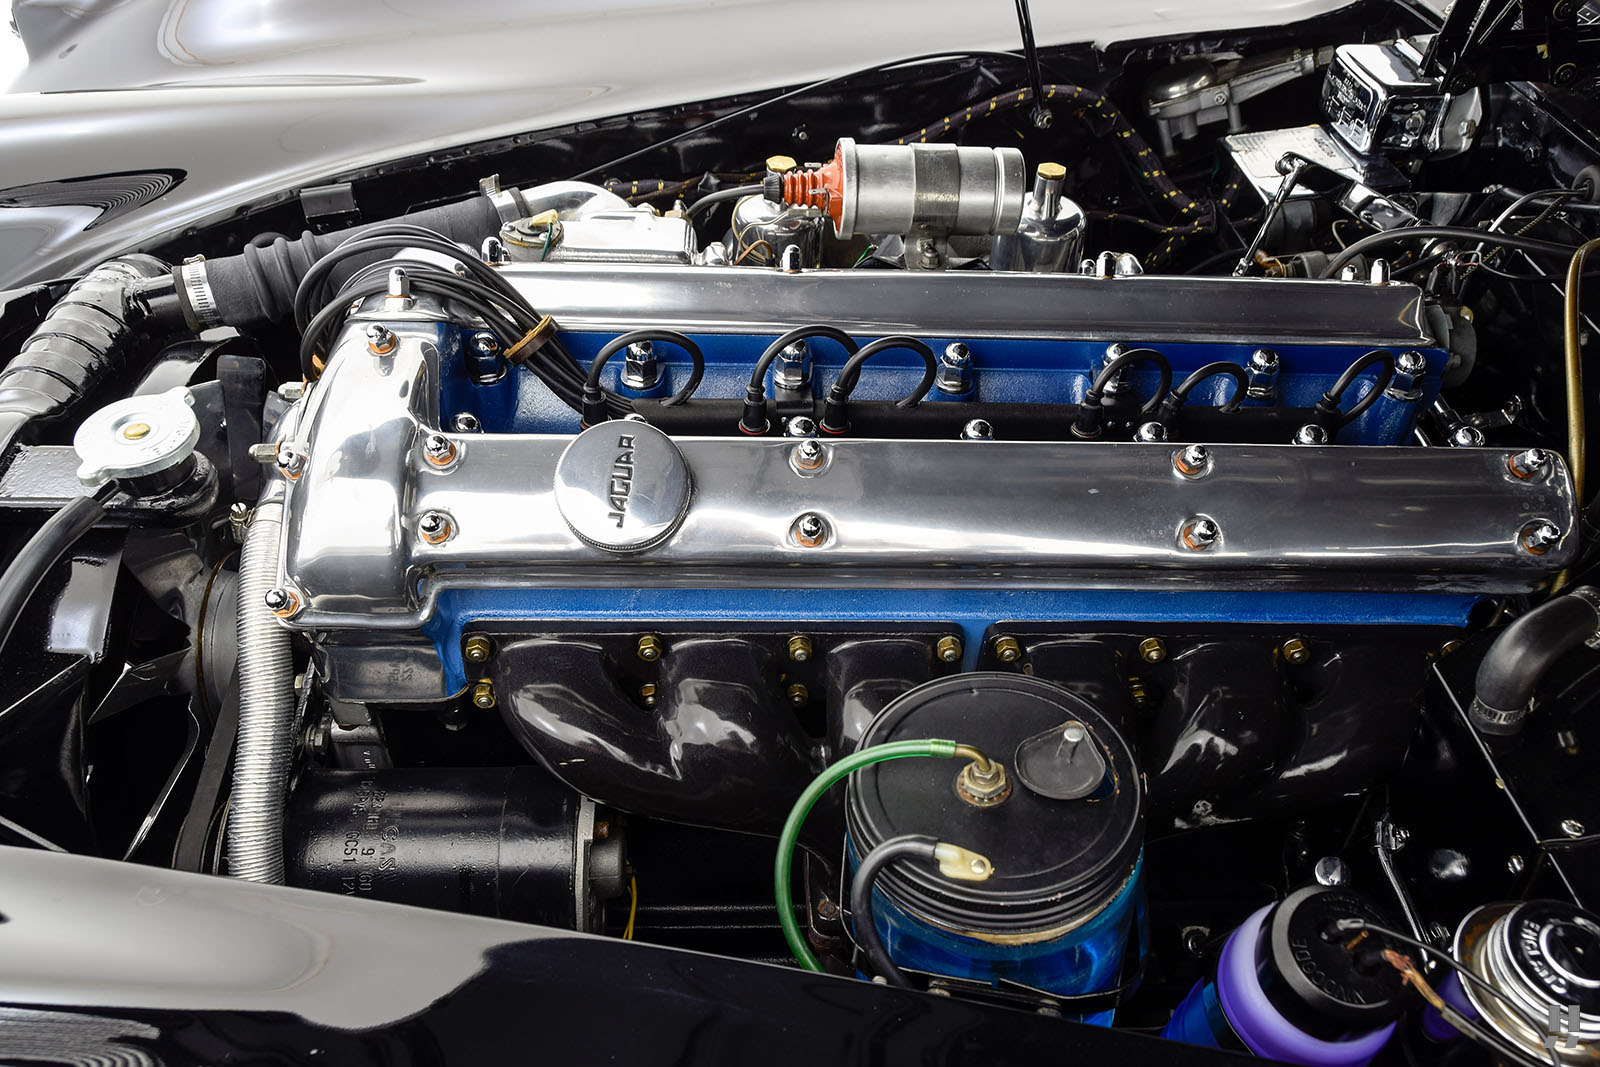 1960 Jaguar Xk150 38 Fixed Head Coupe Hyman Ltd Classic Cars 1960s